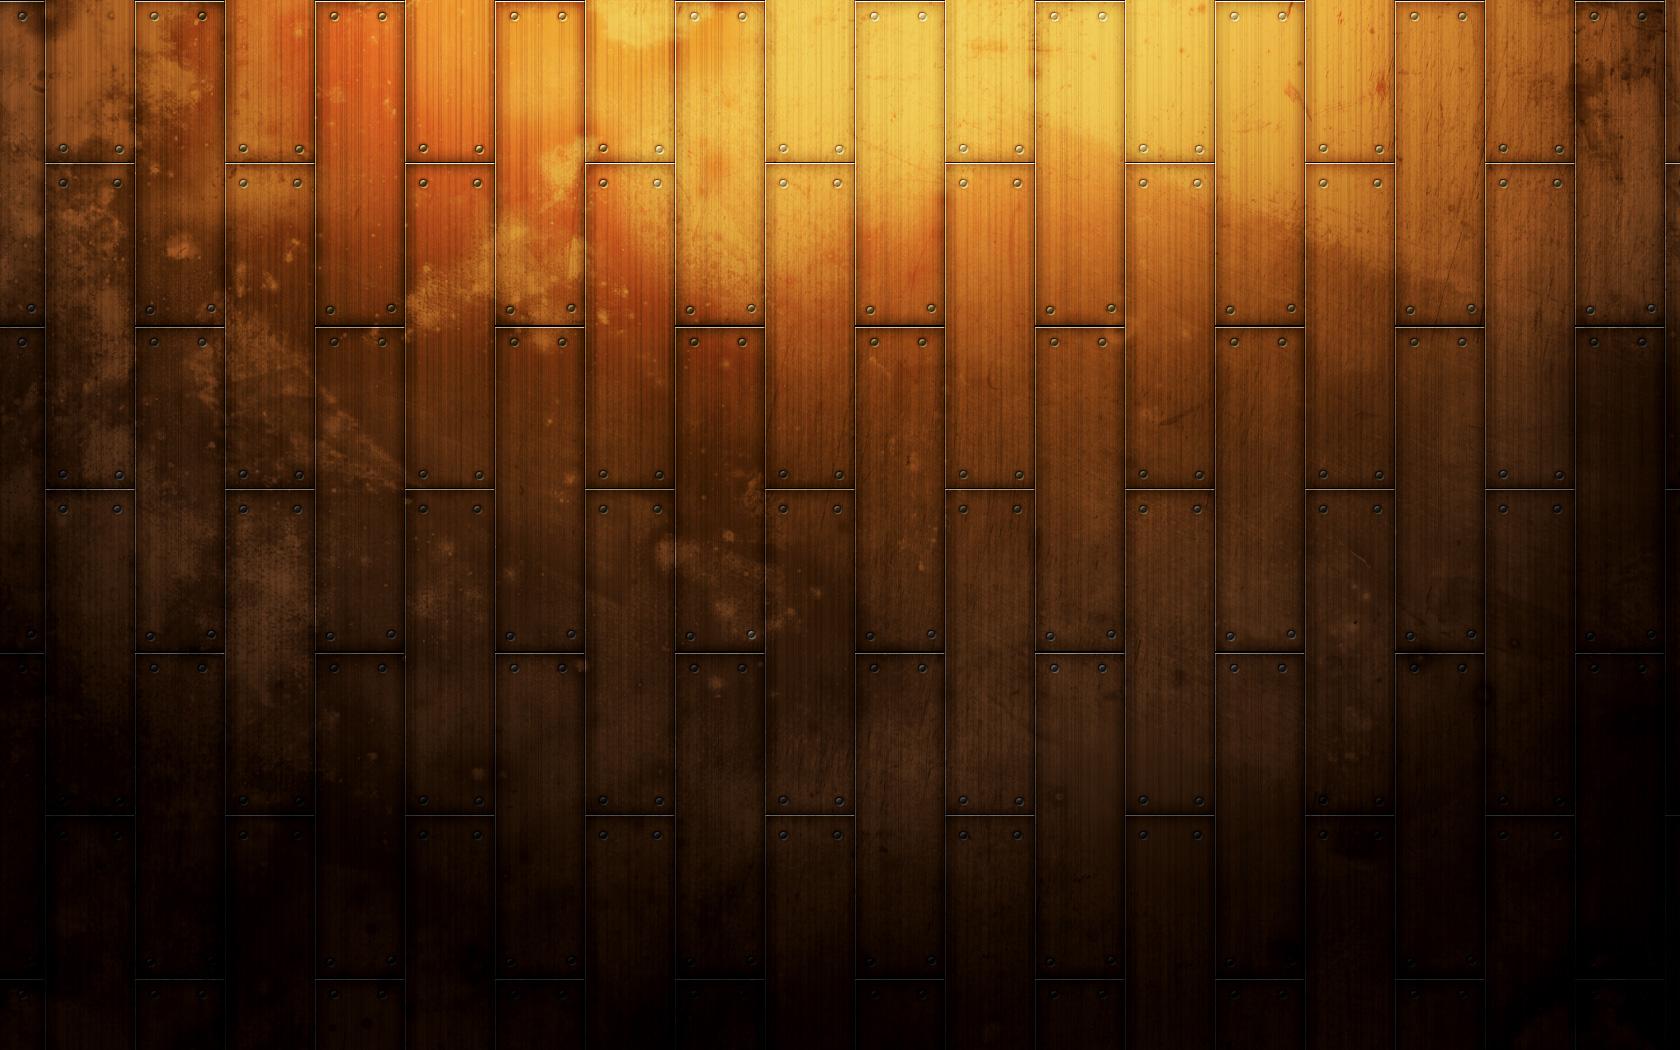 11 Photoshop Backgrounds Designs Images   Wood Photoshop 1680x1050